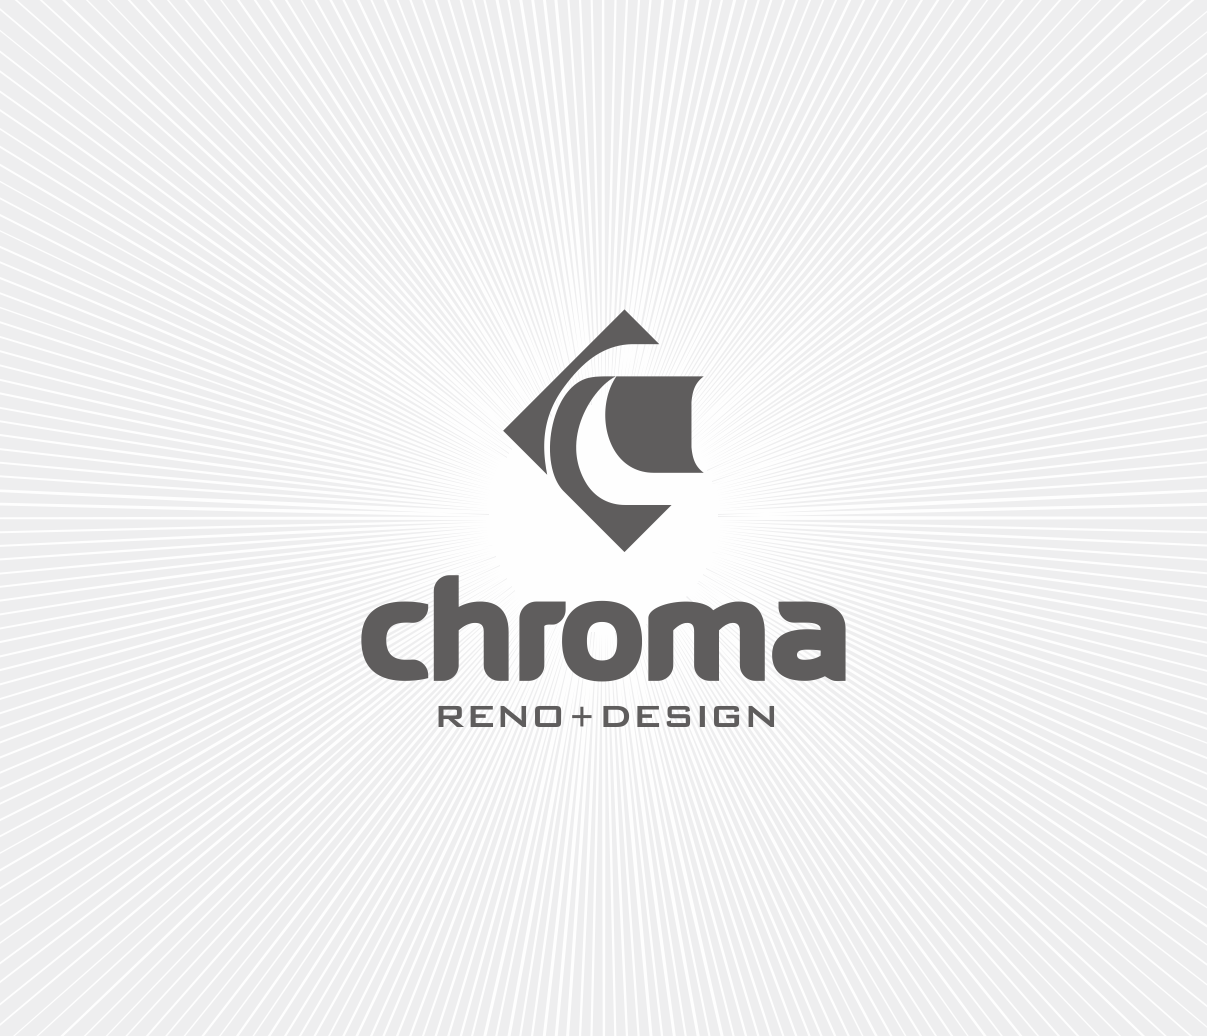 Logo Design by Armada Jamaluddin - Entry No. 126 in the Logo Design Contest Inspiring Logo Design for Chroma Reno+Design.